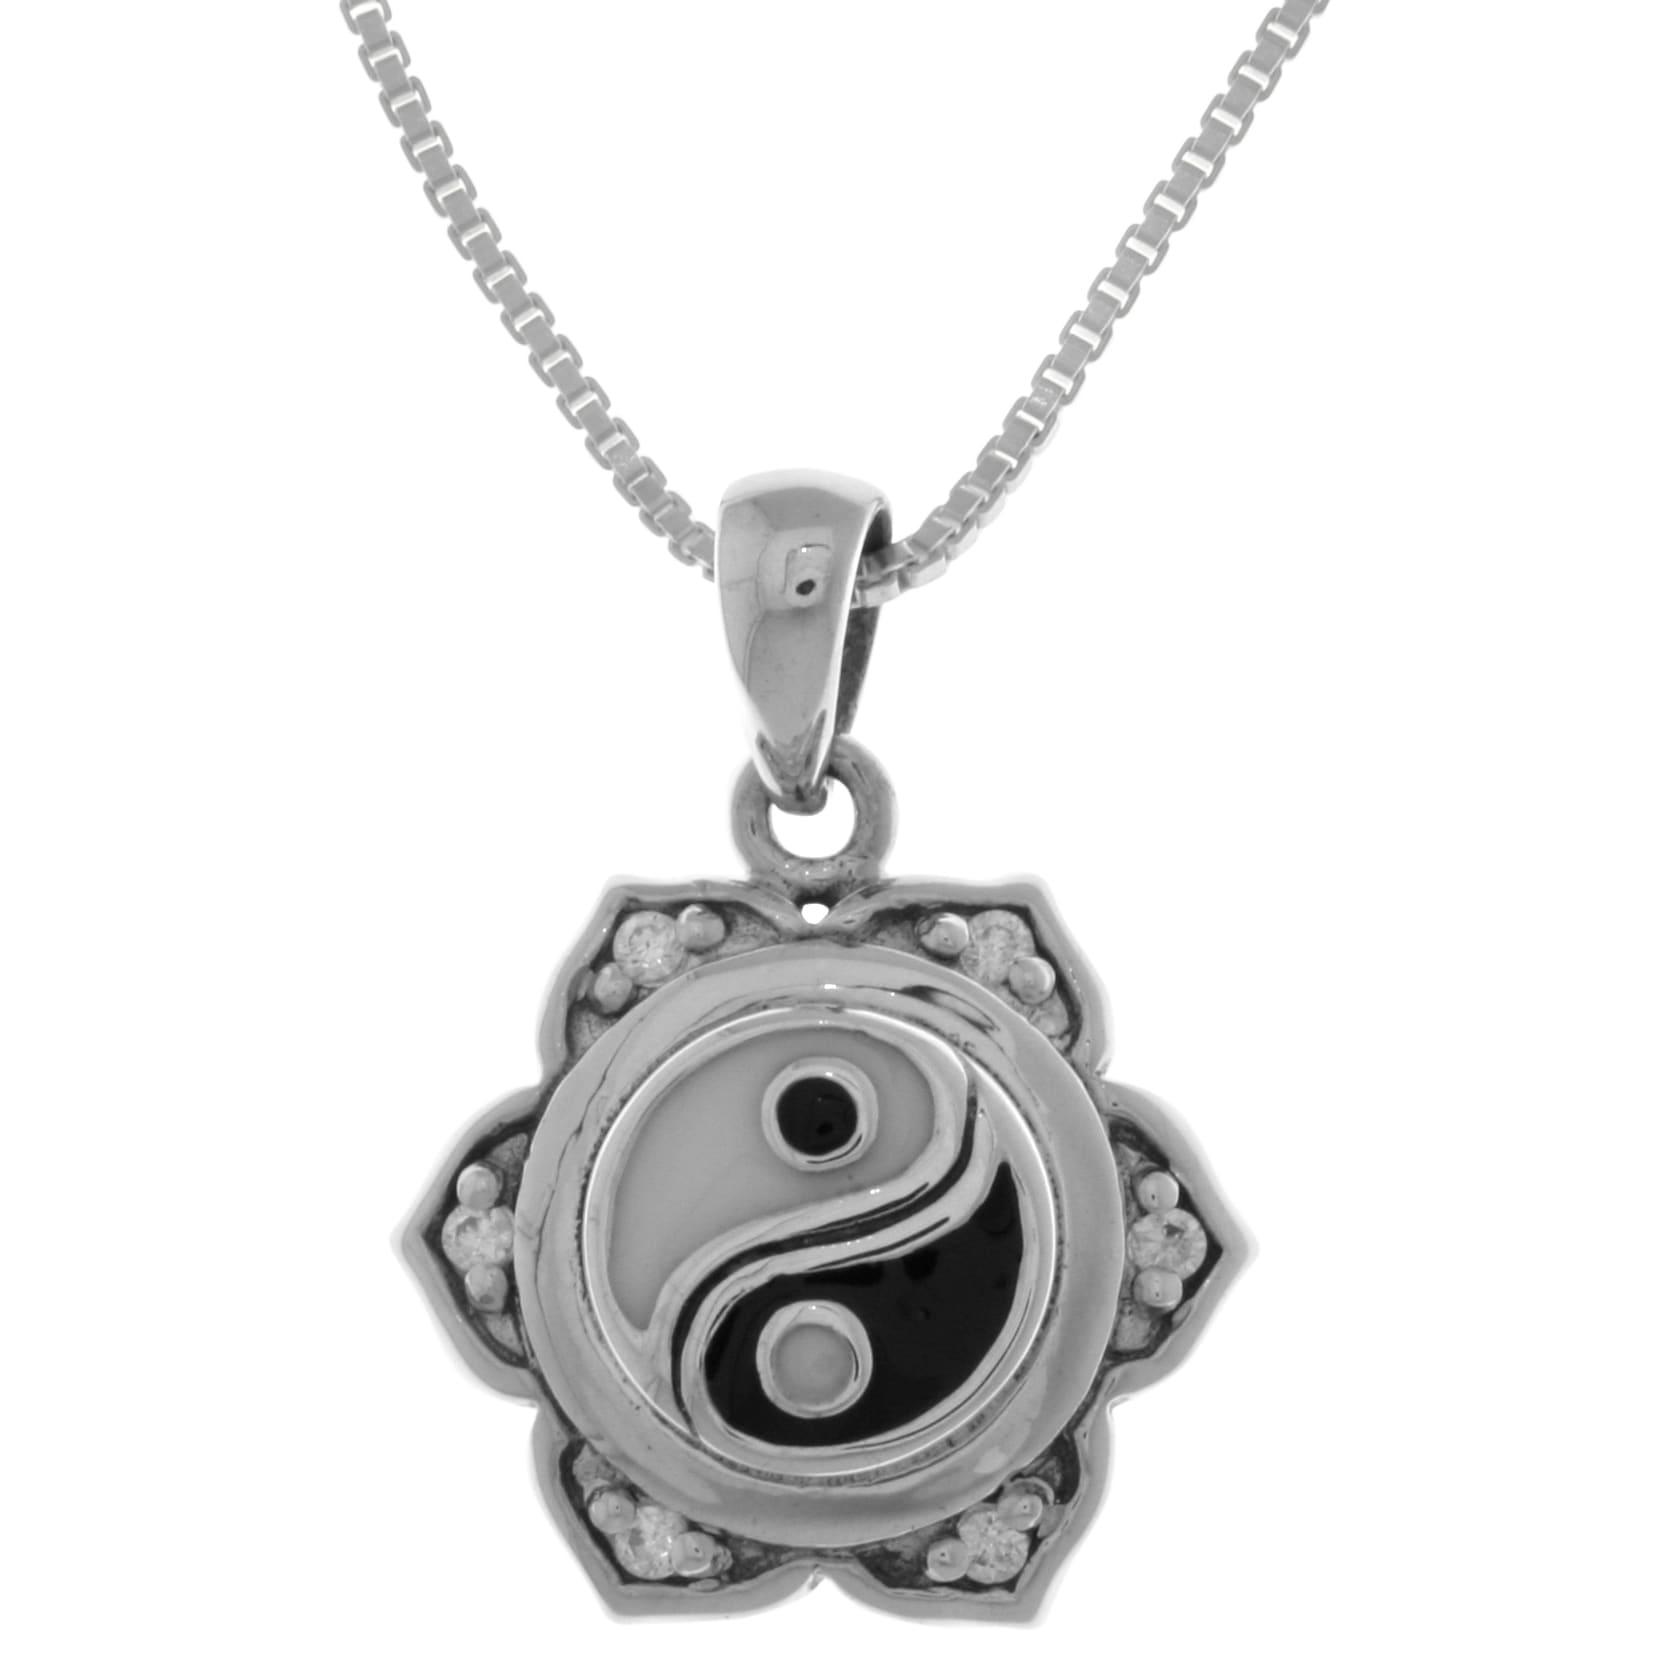 Sterling silver cubic zirconia yin yang lotus flower pendant white sterling silver cubic zirconia yin yang lotus flower pendant white free shipping today overstock 18298064 izmirmasajfo